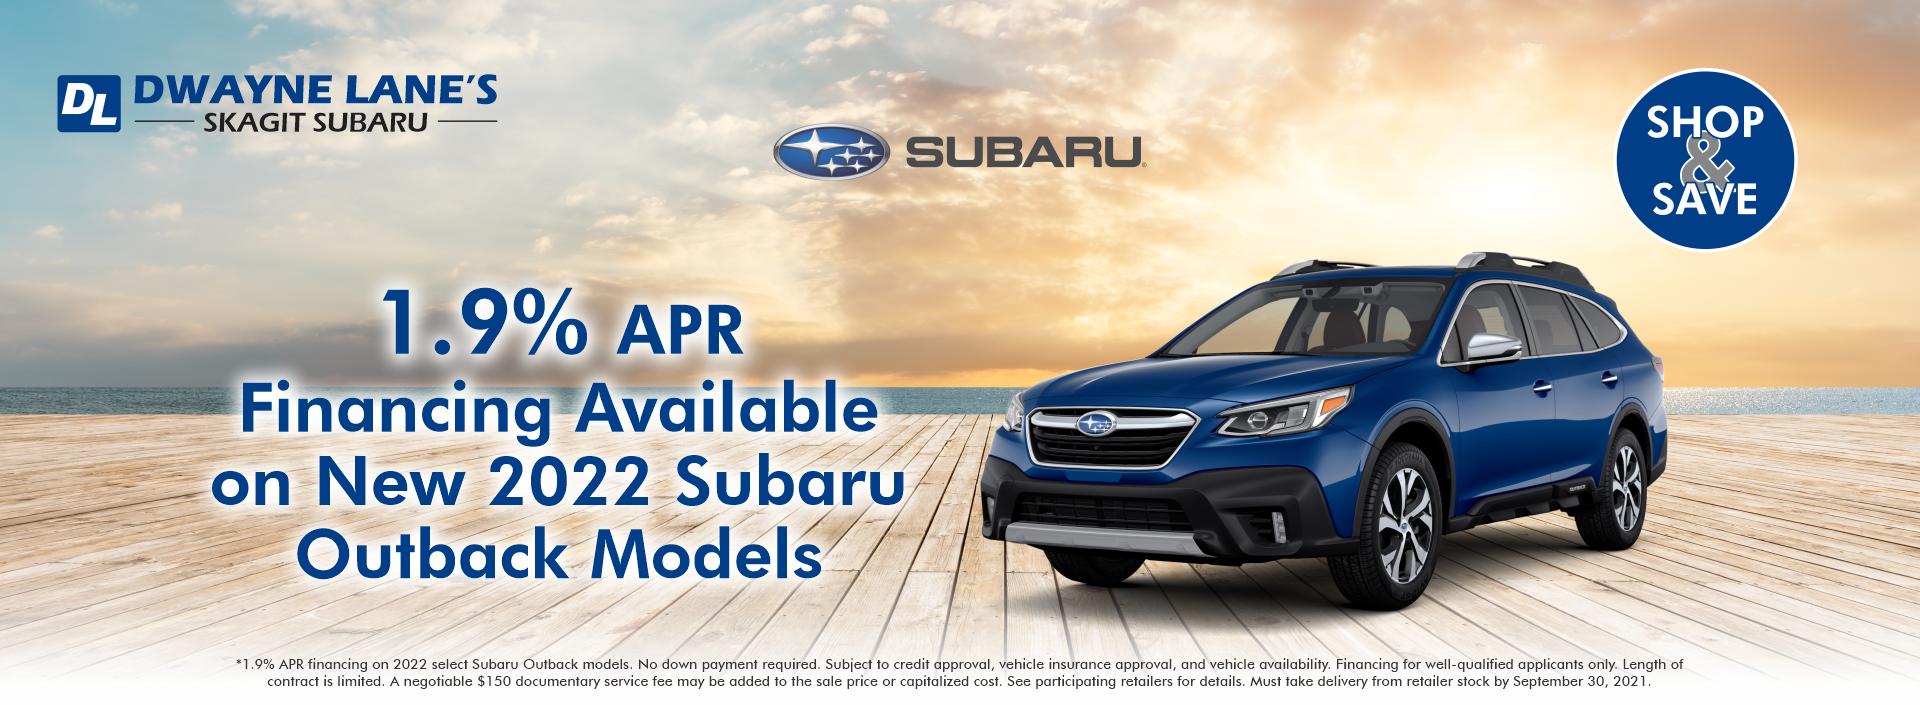 2021SeptBanners-DLAF-Subaru-2